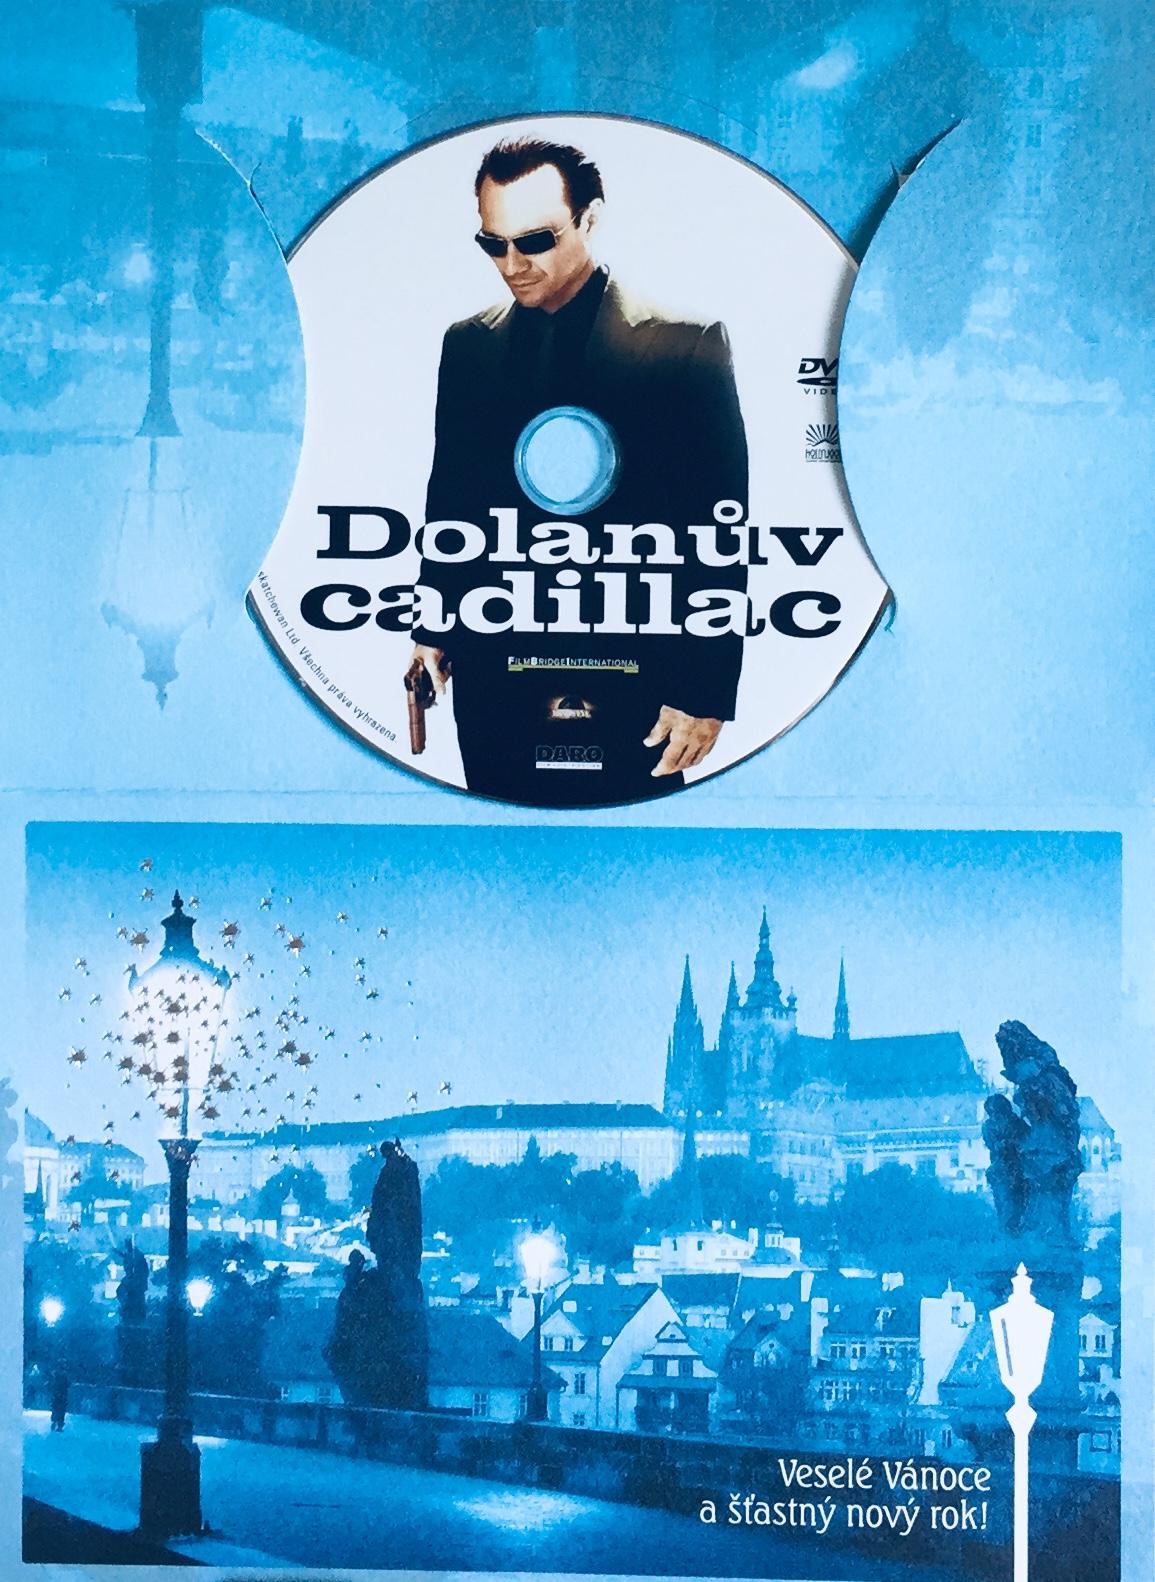 Dolanův cadillac - DVD /dárkový obal/